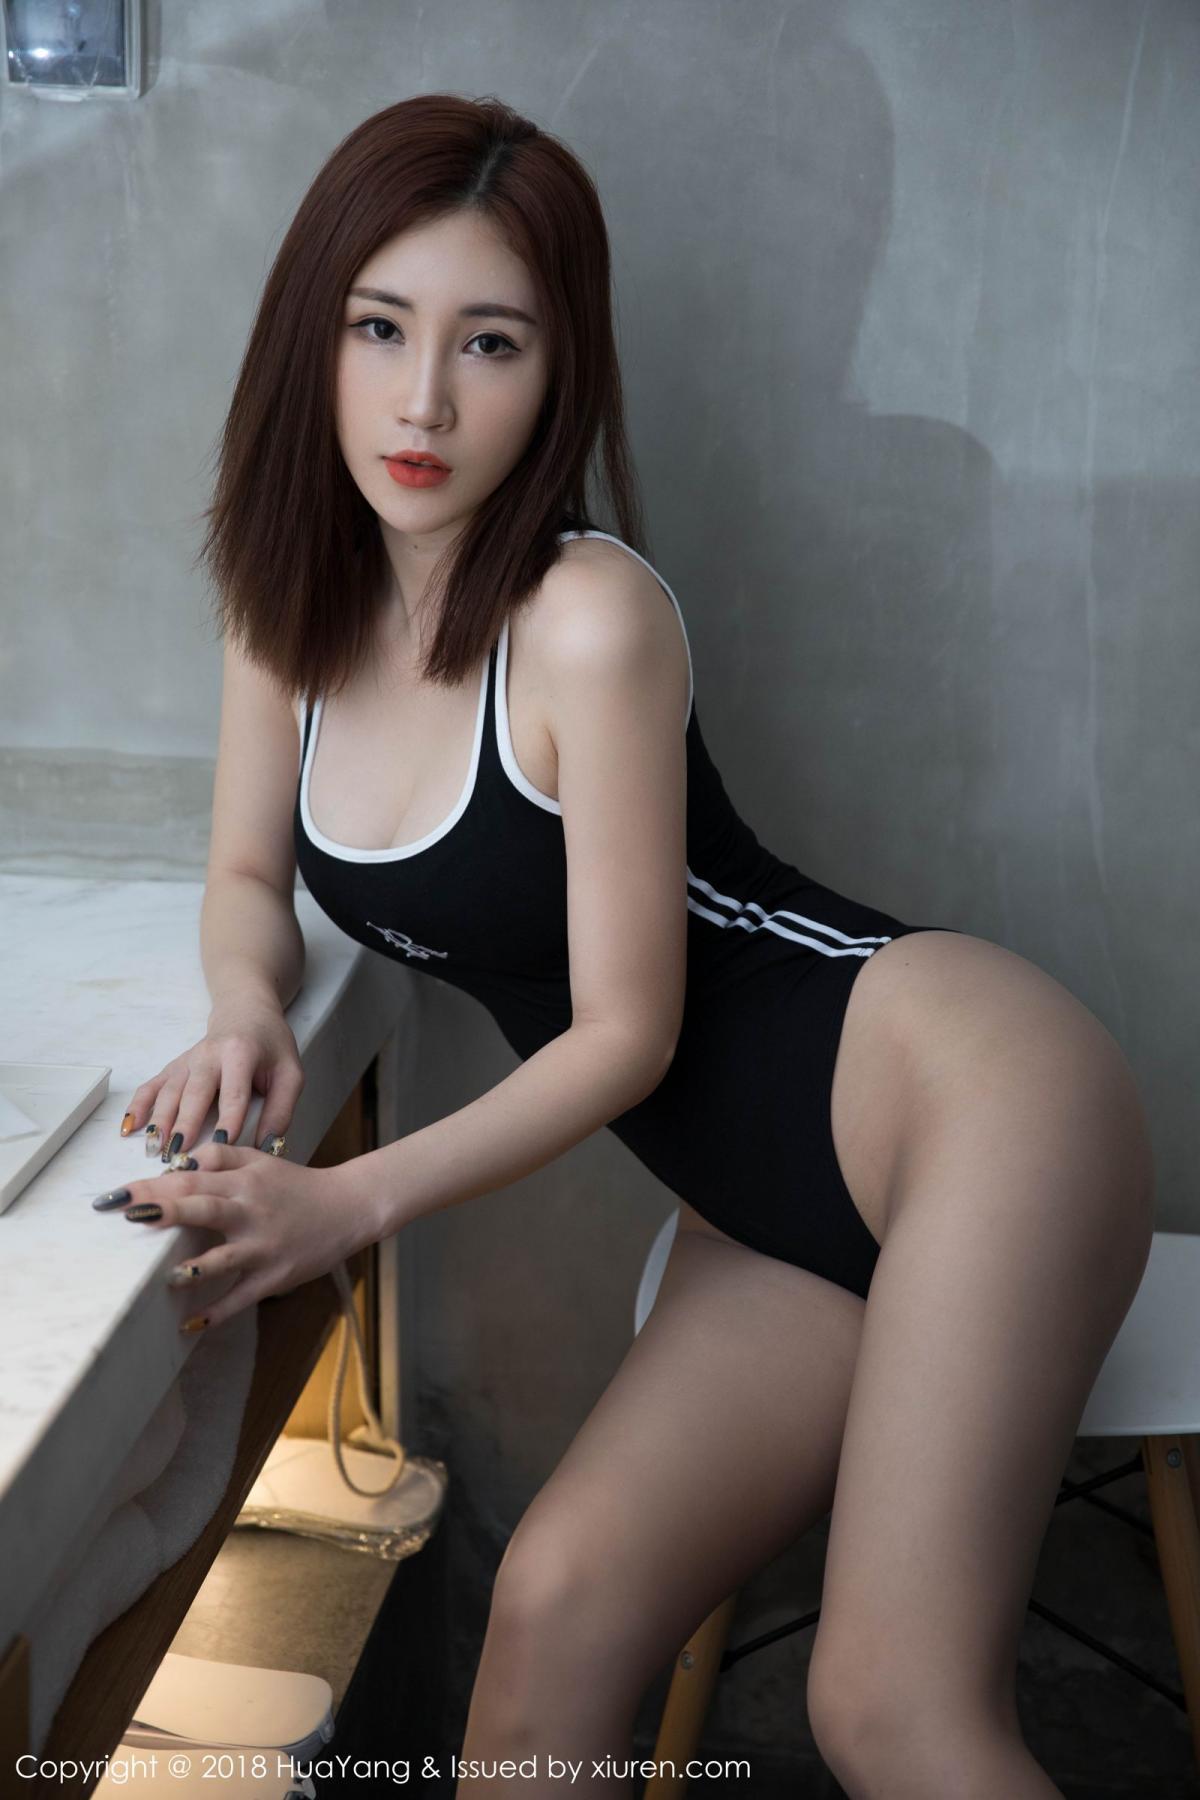 [Huayang] Vol.092 Sun Meng Yao 45P, HuaYang, Nurse, Sun Meng Yao, Tall, Uniform